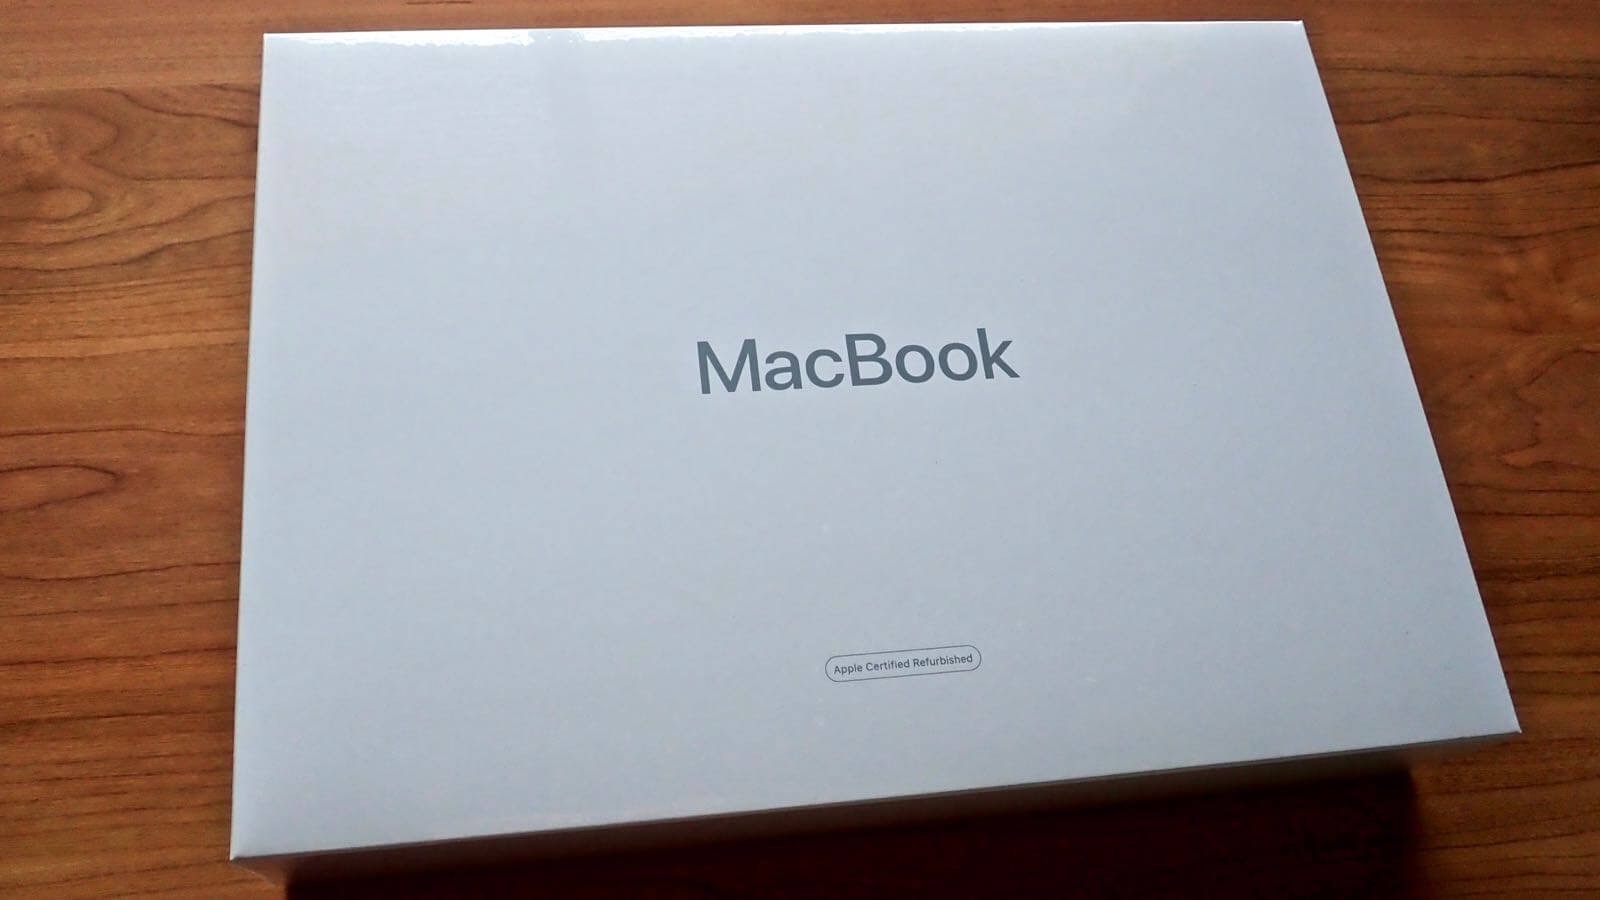 0202 Apple maintenance item Quality MacBook 2017 12inch 004